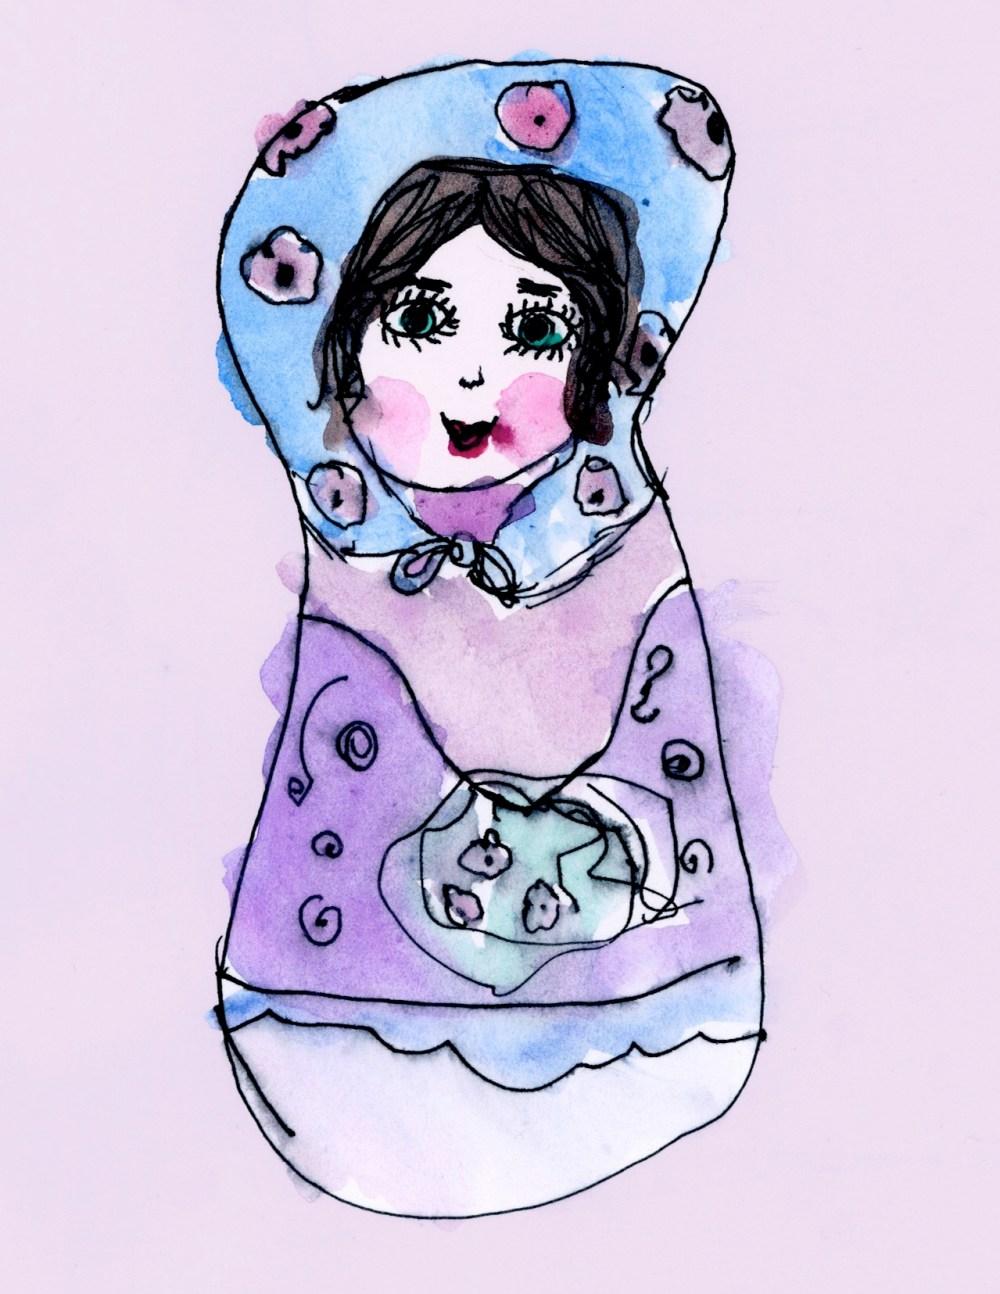 Matryshka by Rosie, age 7